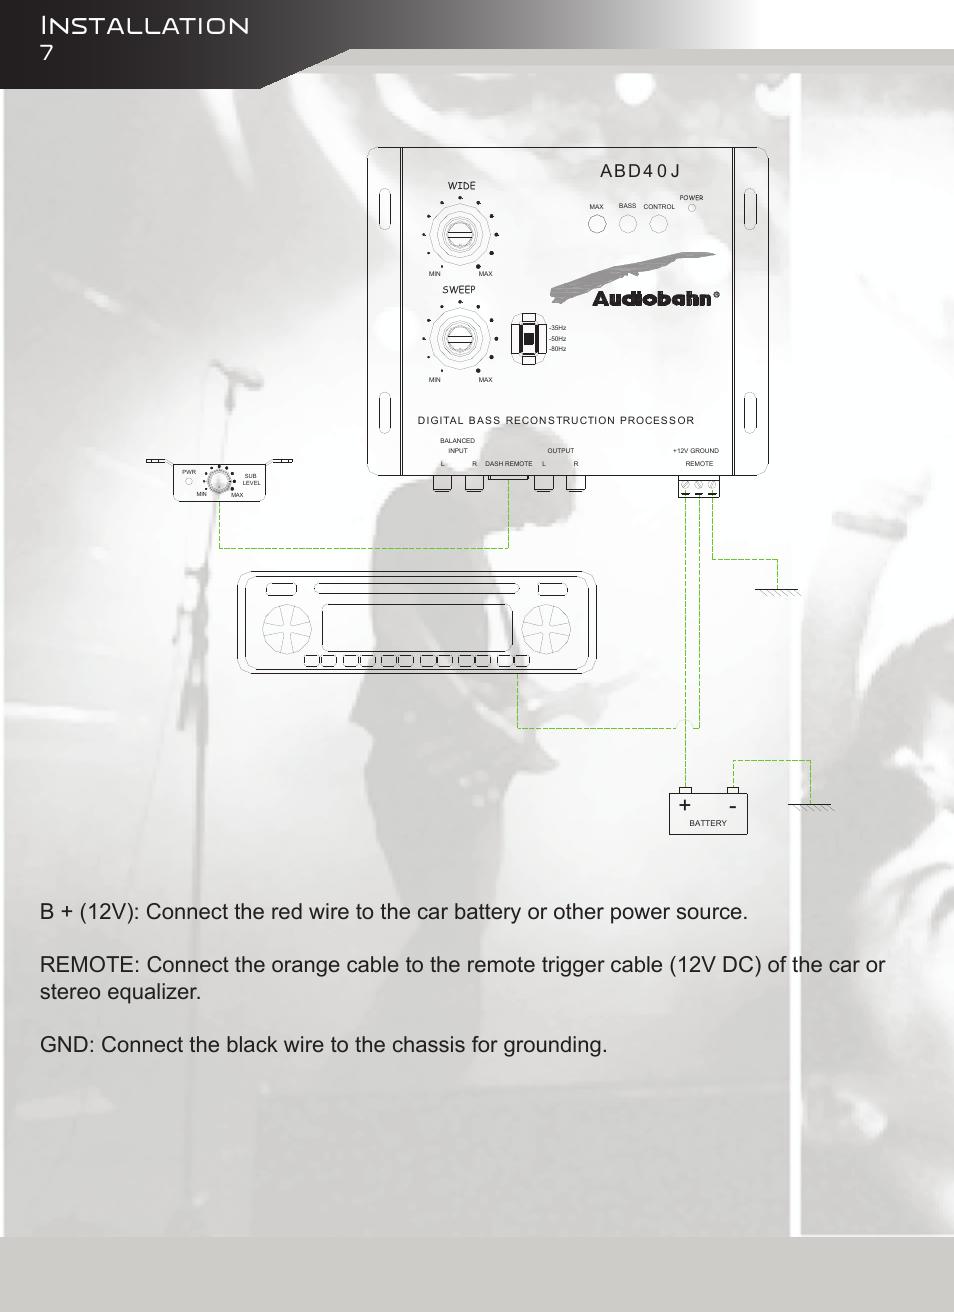 installation abd4 0 j audiobahn abd40j user manual page 8 12 rh manualsdir com Audiobahn Speakers Audiobahn Subwoofers